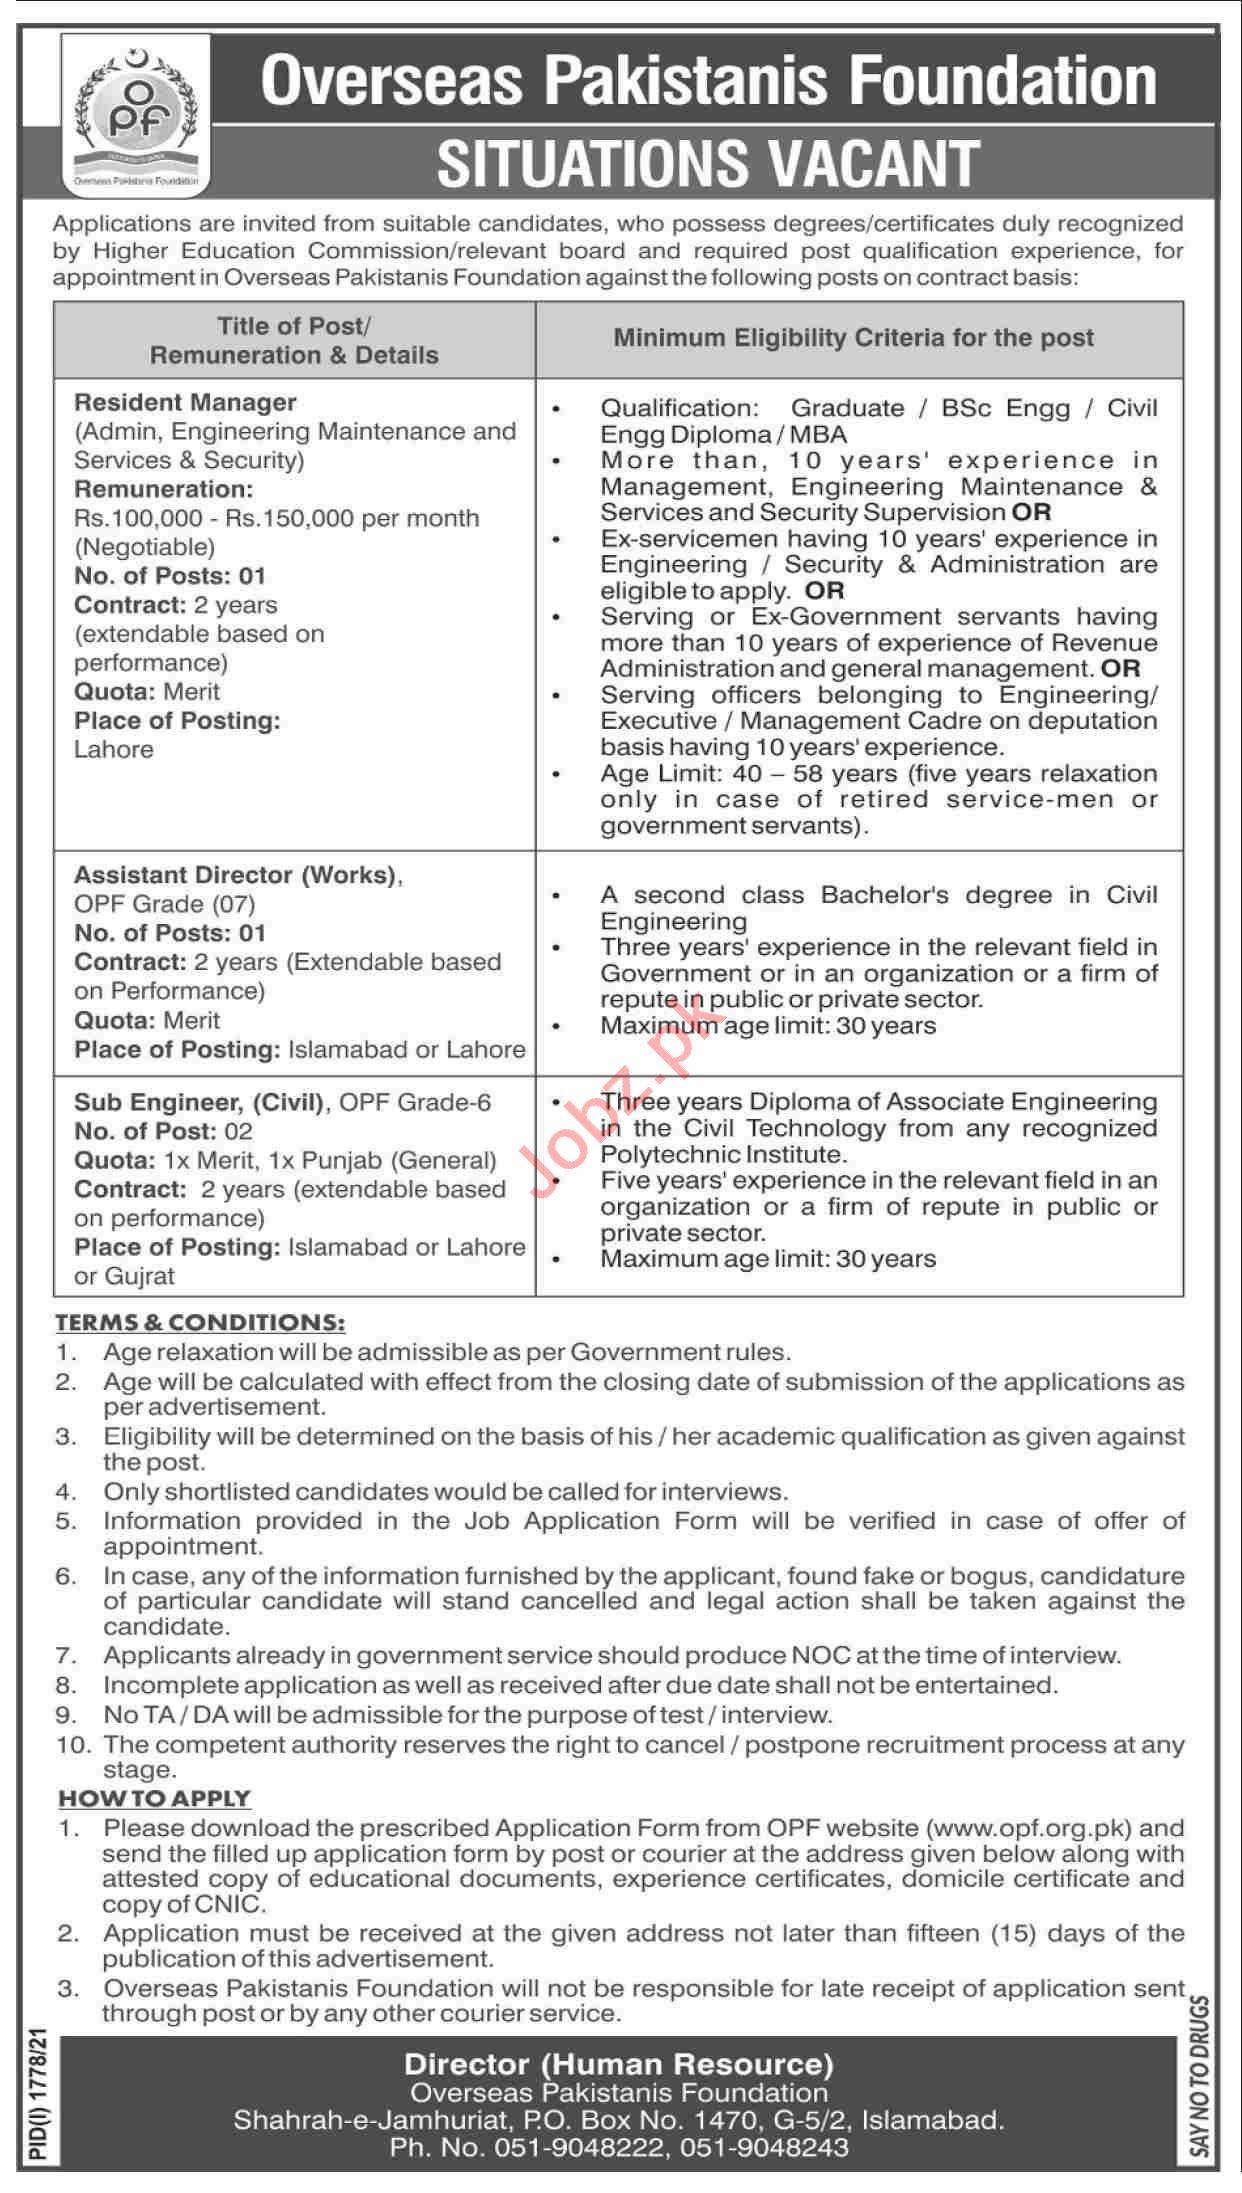 Overseas Pakistanis Foundation OPF Islamabad Jobs 2021